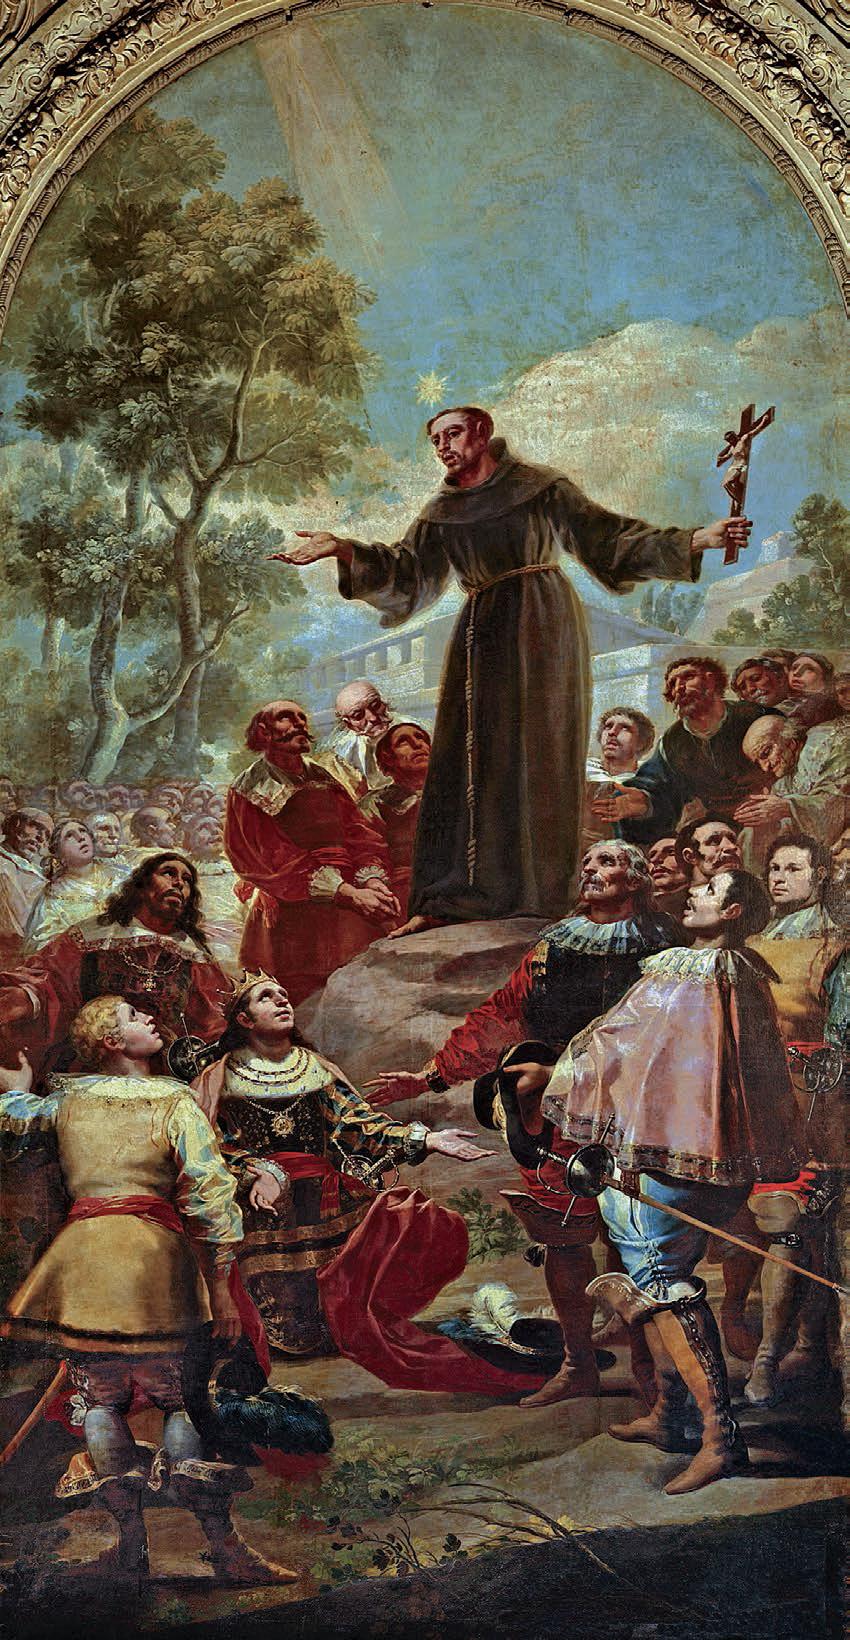 Francisco de Goya, Public domain, via Wikimedia Commons